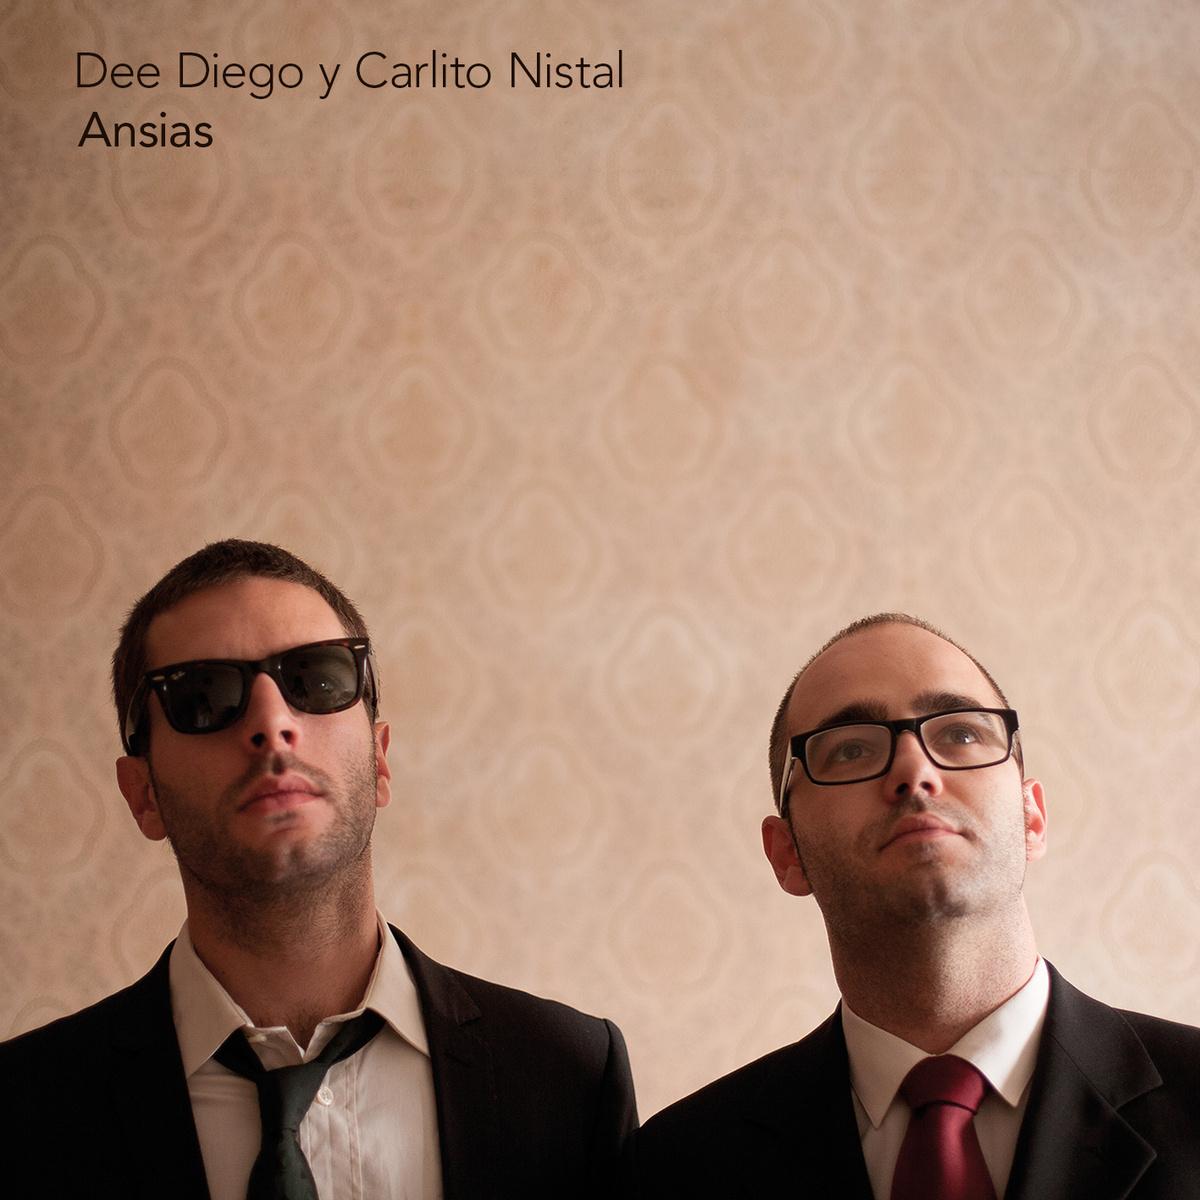 Dee_diego_carlito_nistal